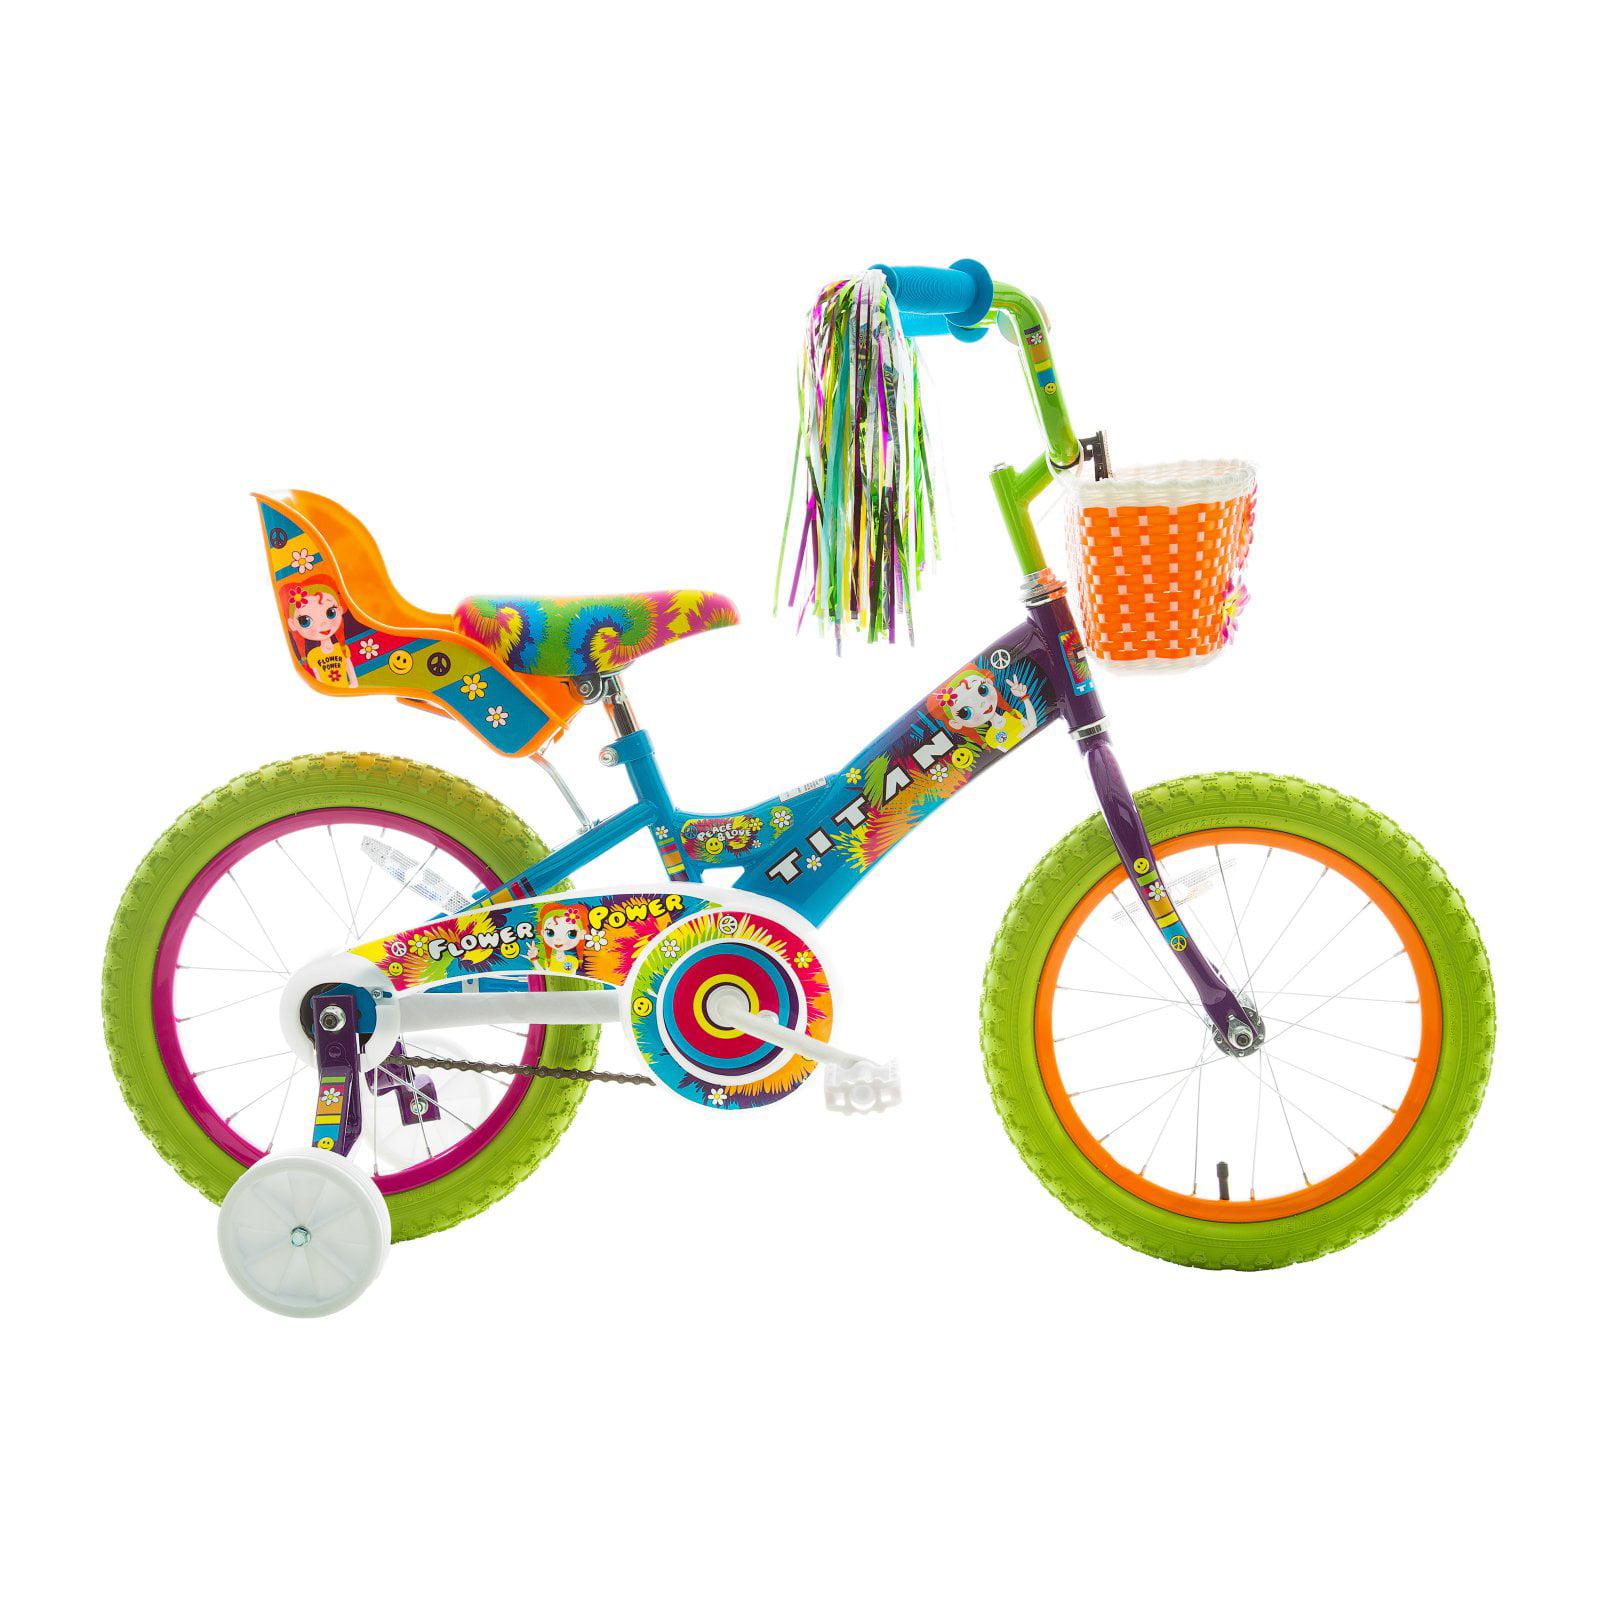 "Titan Girl's Flower Power Princess 16"" BMX Bike with Training Wheels, Doll Seat,... by Titan"